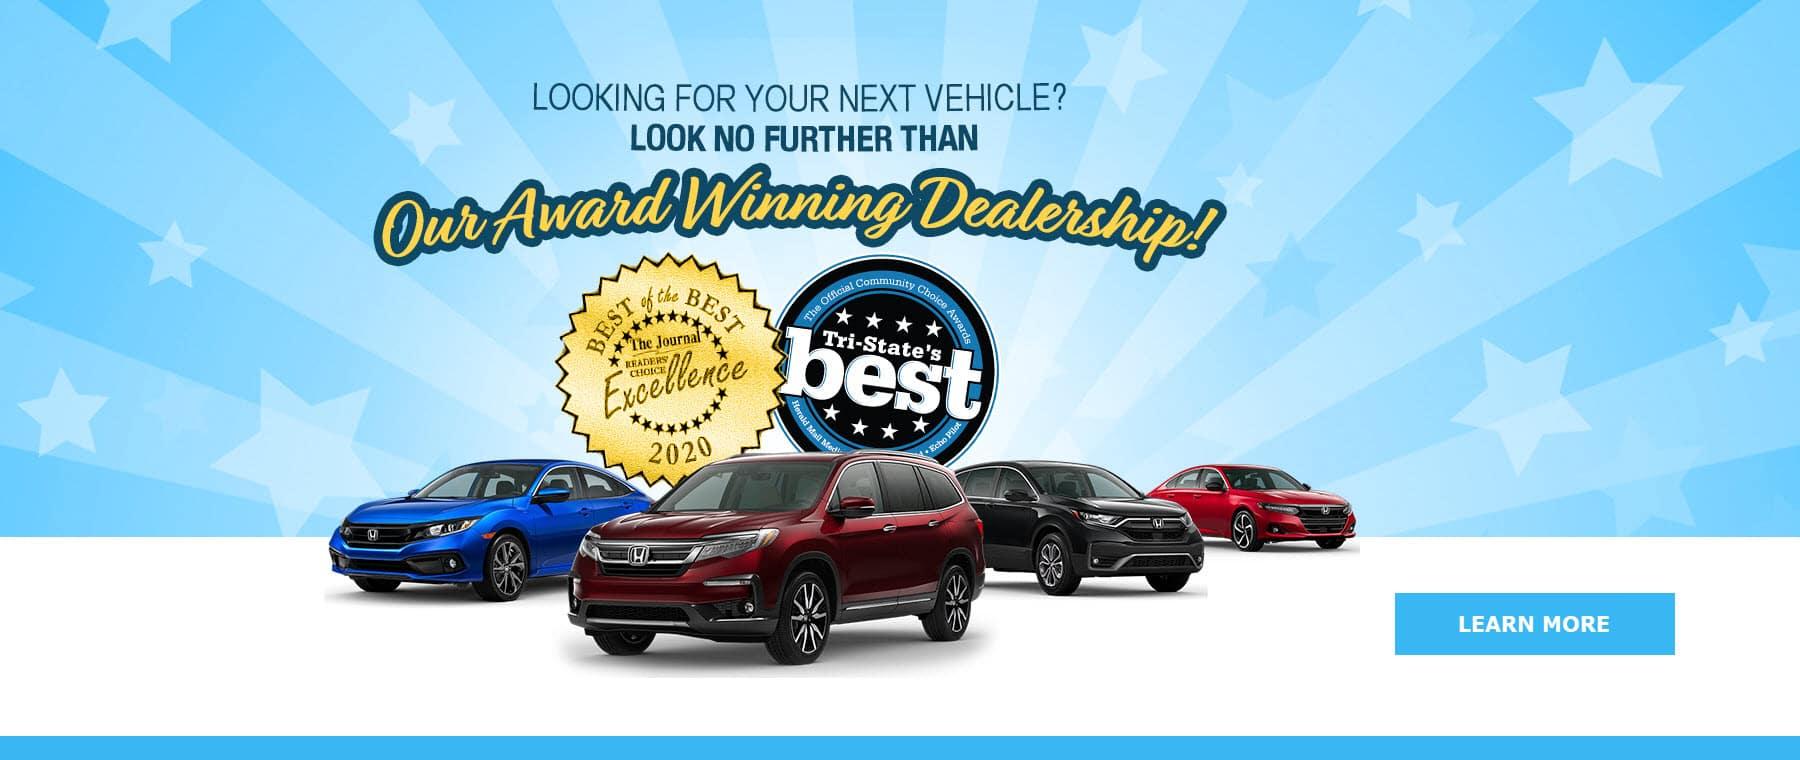 Award Winning Dealership